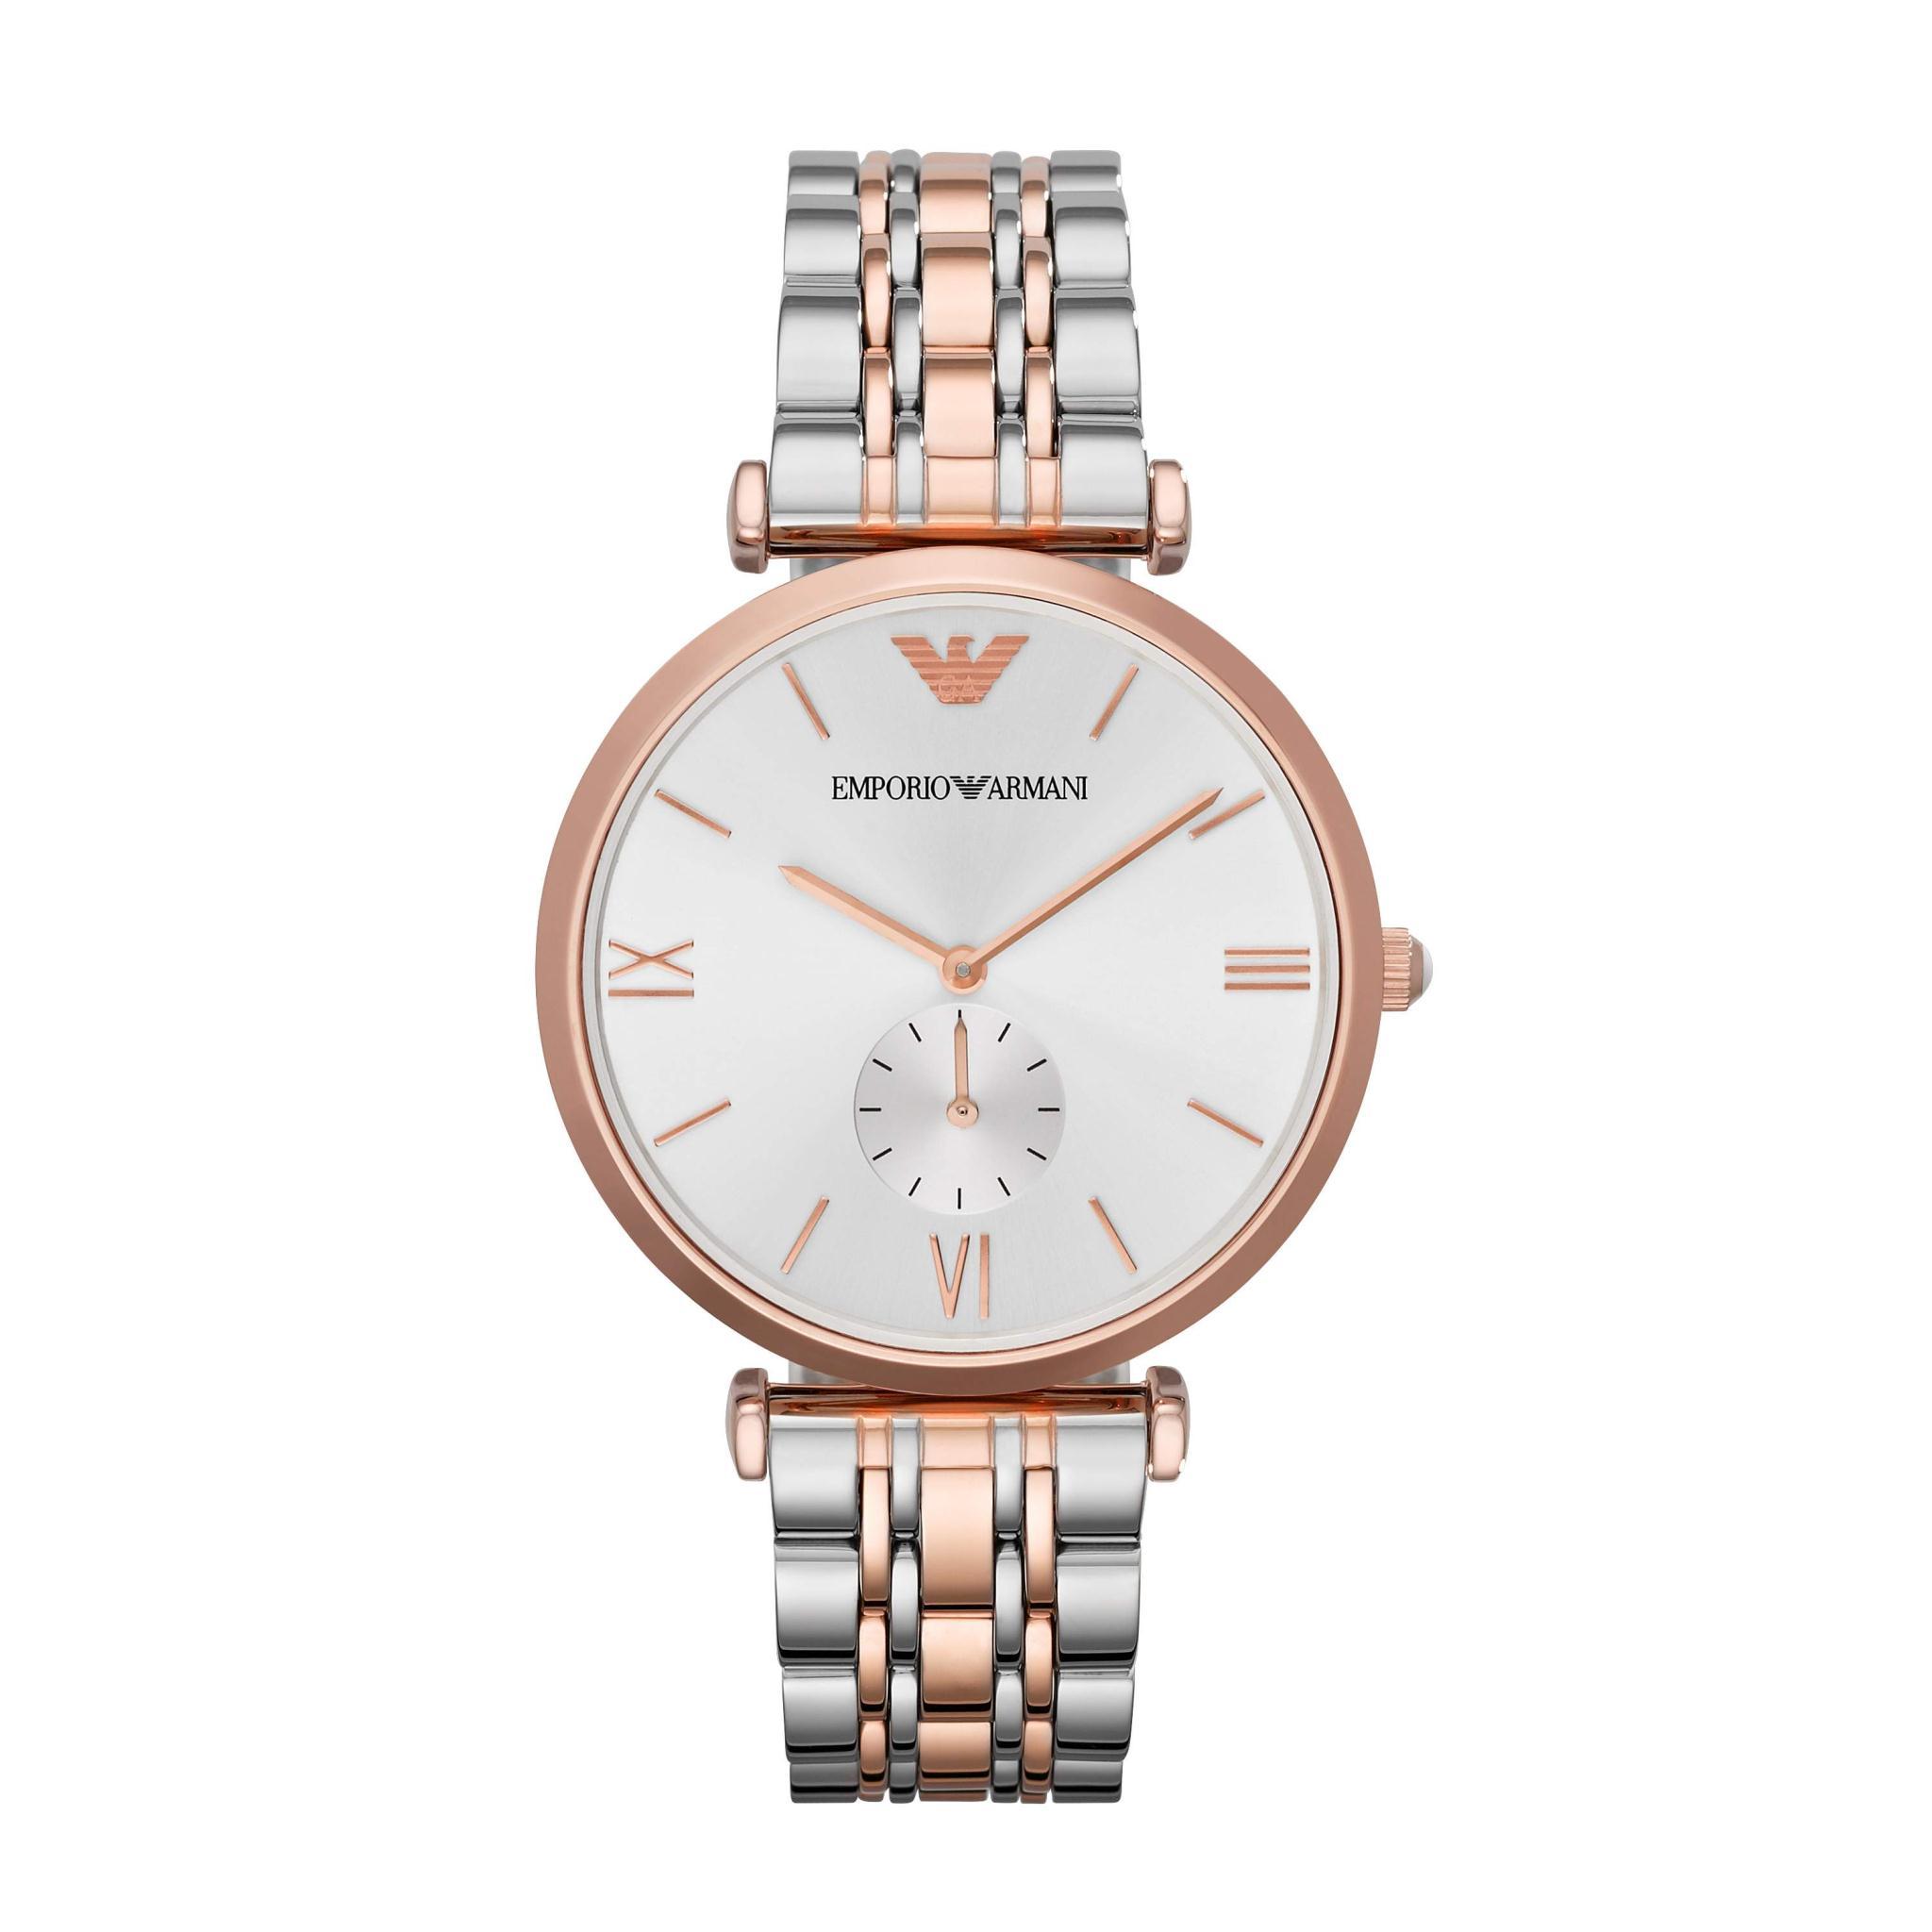 Emporio Armani AR1677 Mens Rose Gold & Steel Watch